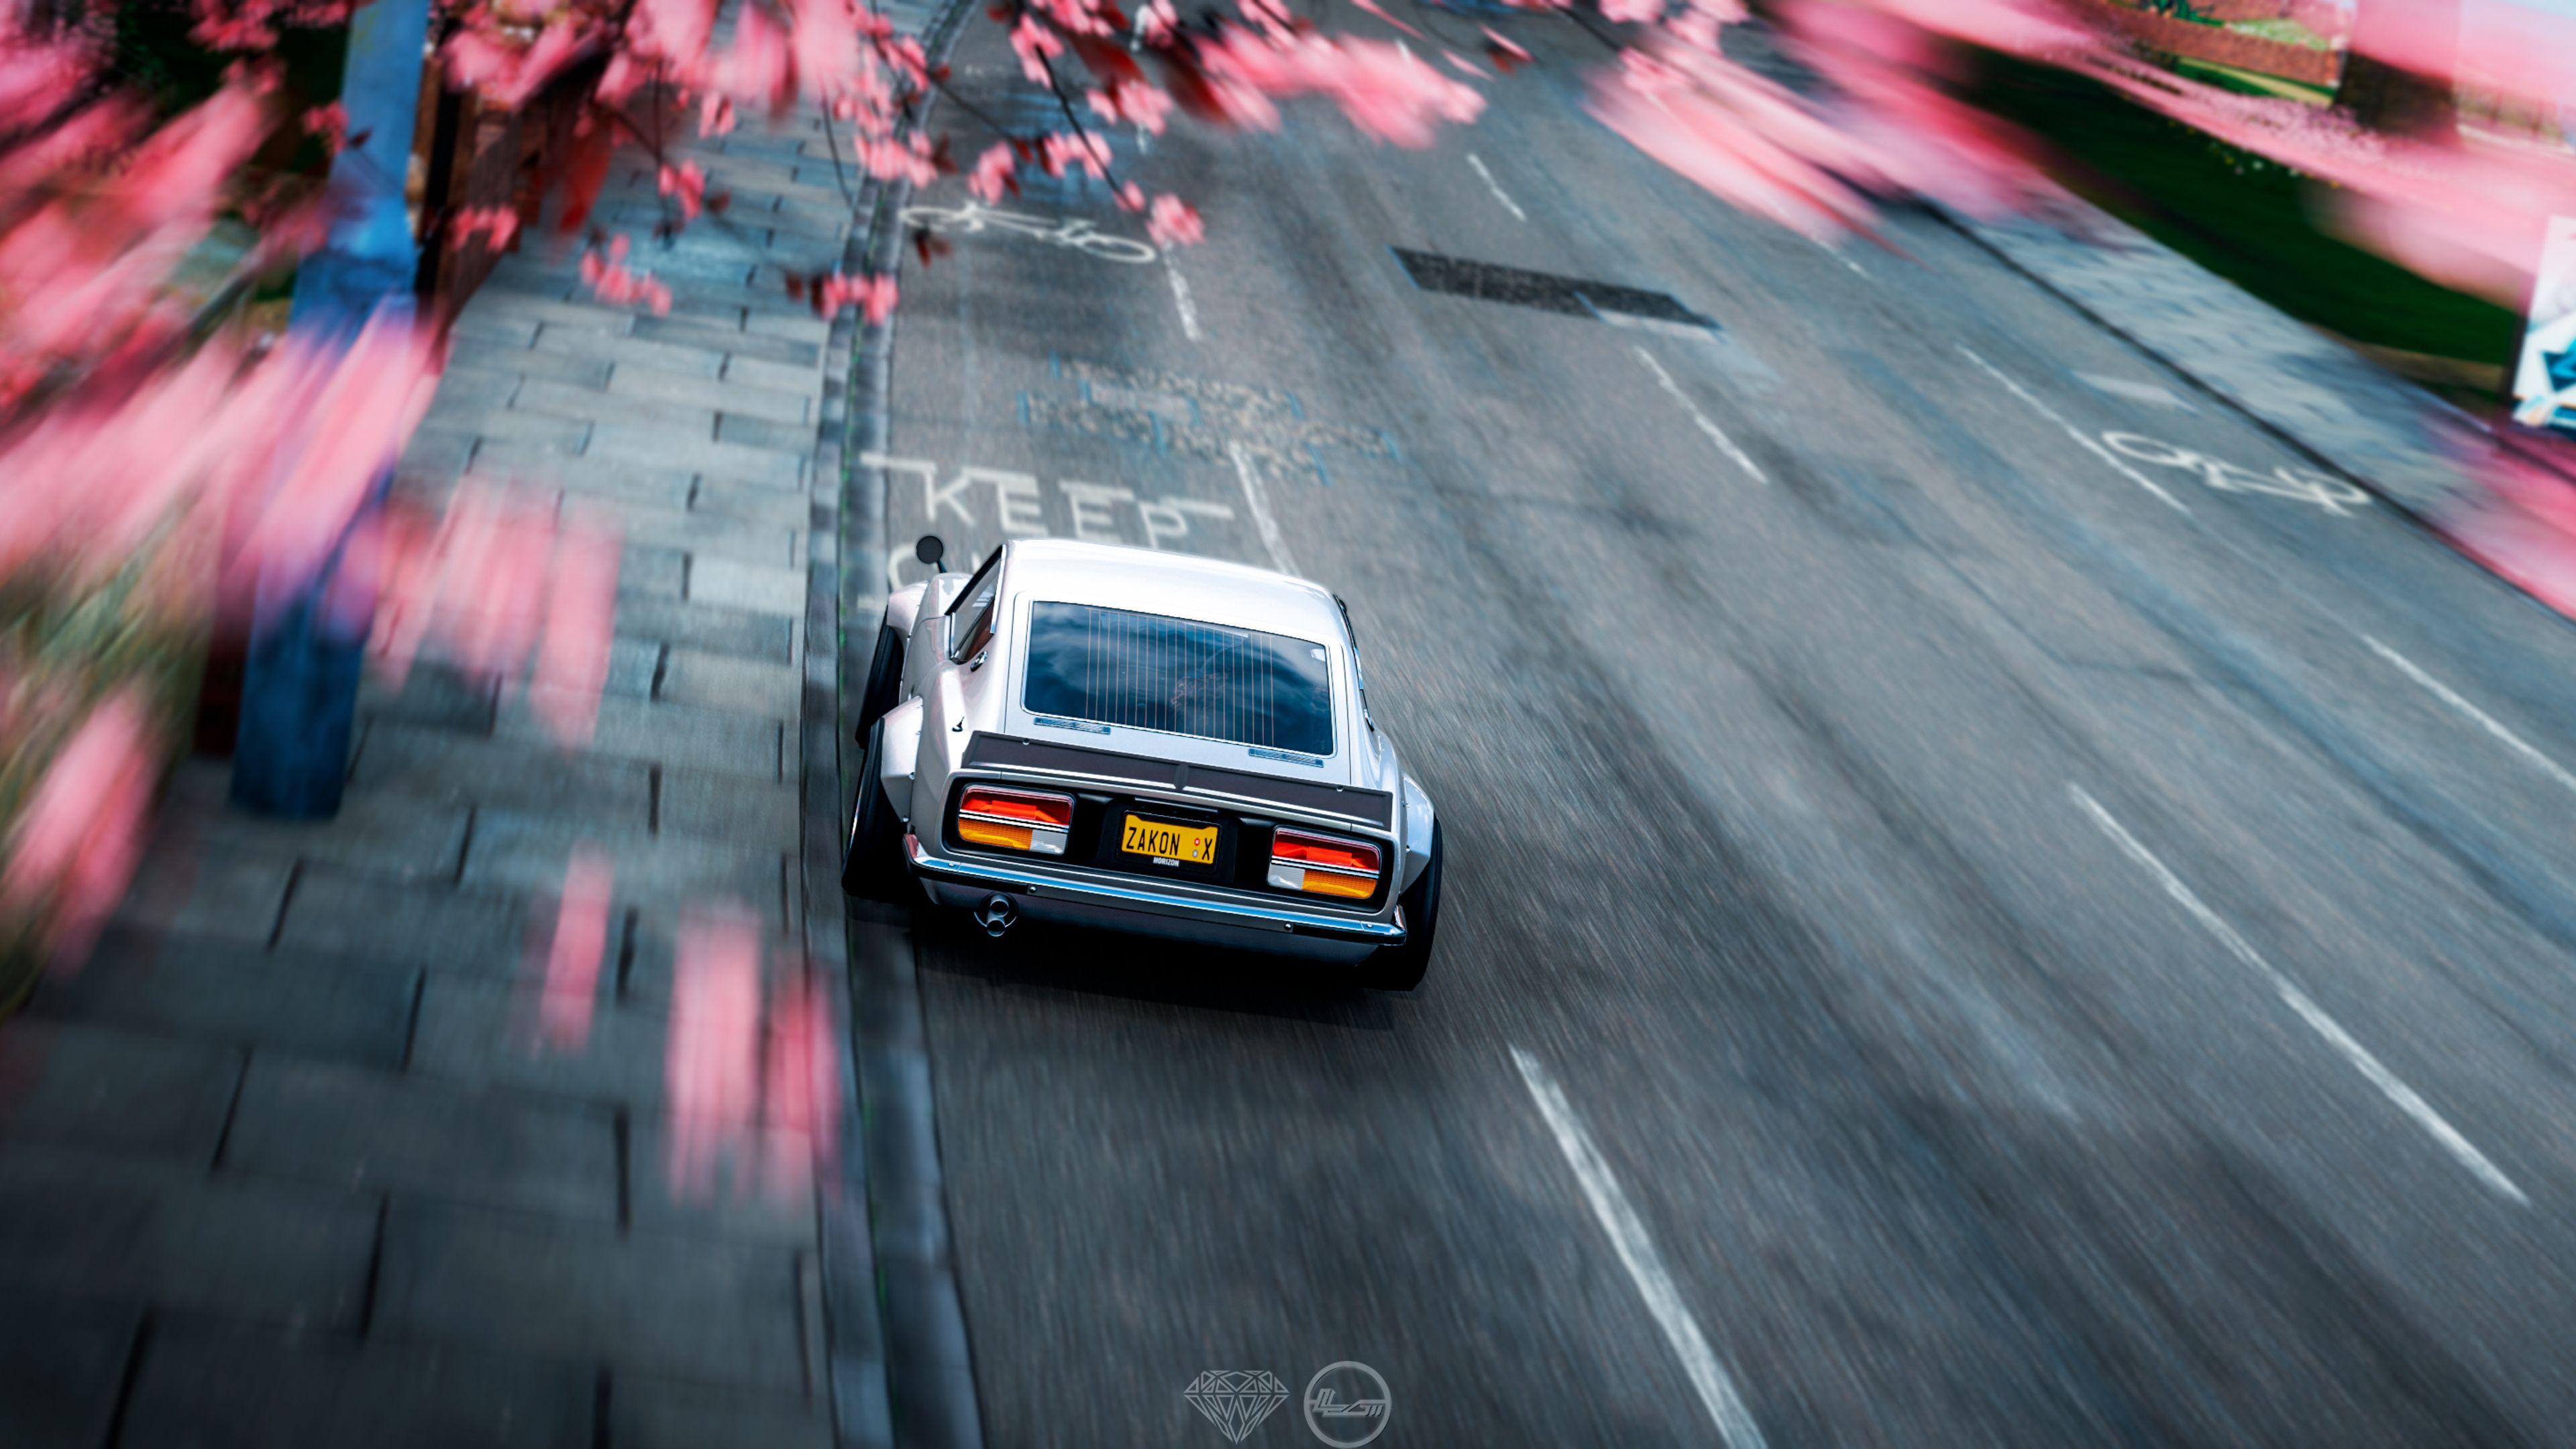 Forza Horizon 4 City Ride 4k Hd Wallpapers Forza Wallpapers Forza Horizon 4 Wallpapers Cars Wallpap Desktop Wallpapers Backgrounds Forza Horizon 4 Car Games